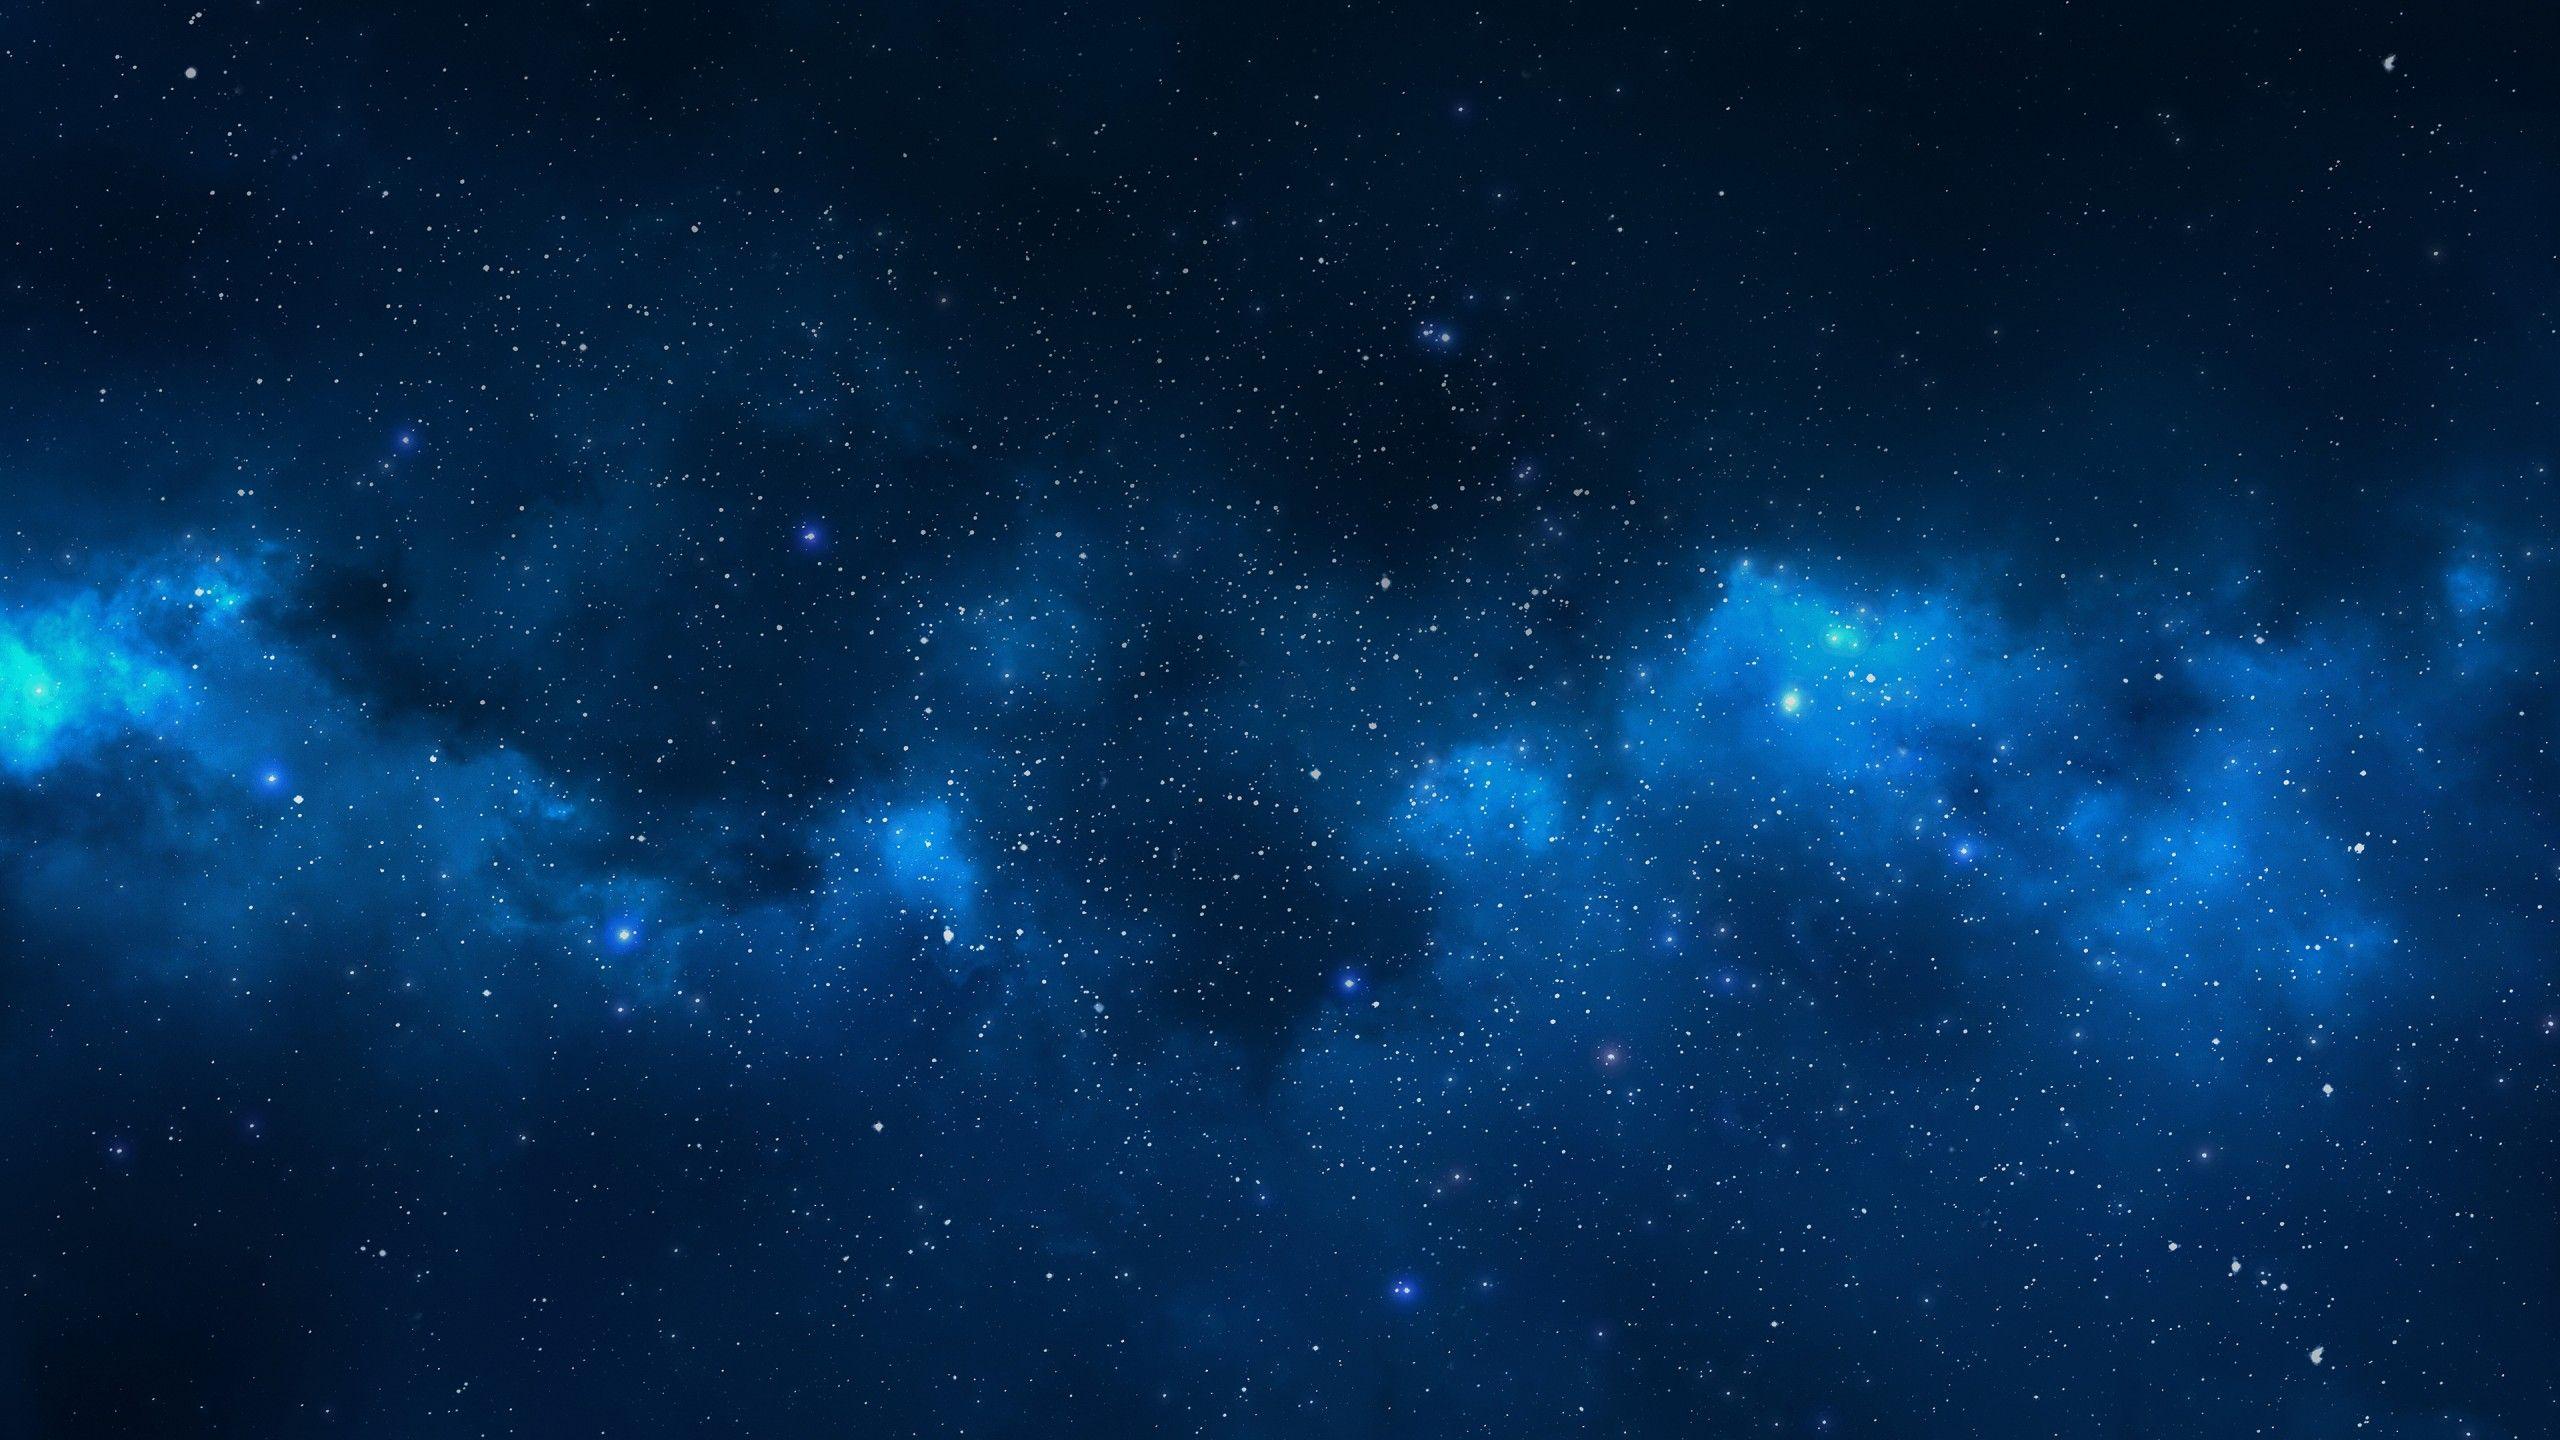 galaxy wallpapers hd 4k (4)